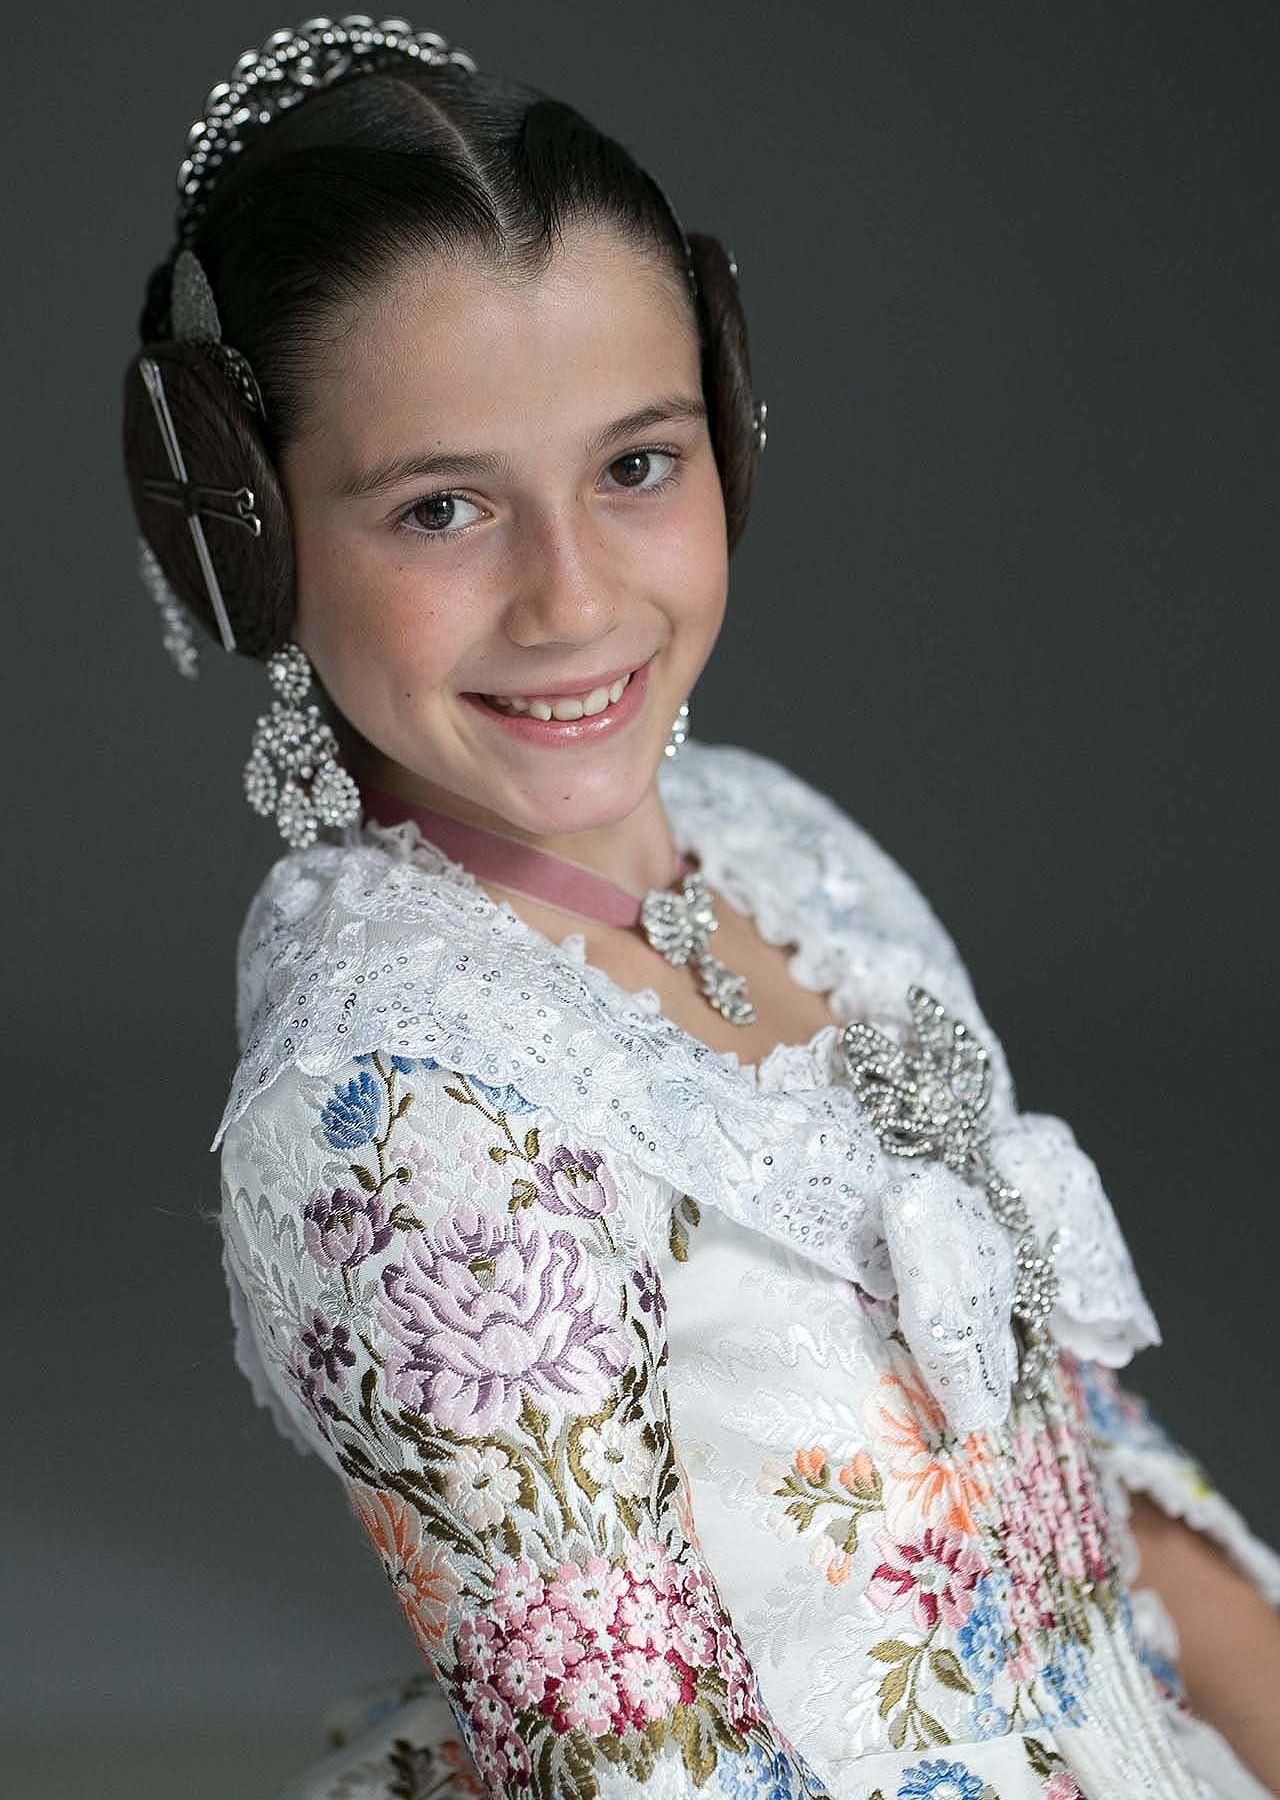 Alicia Insa Rodríguez